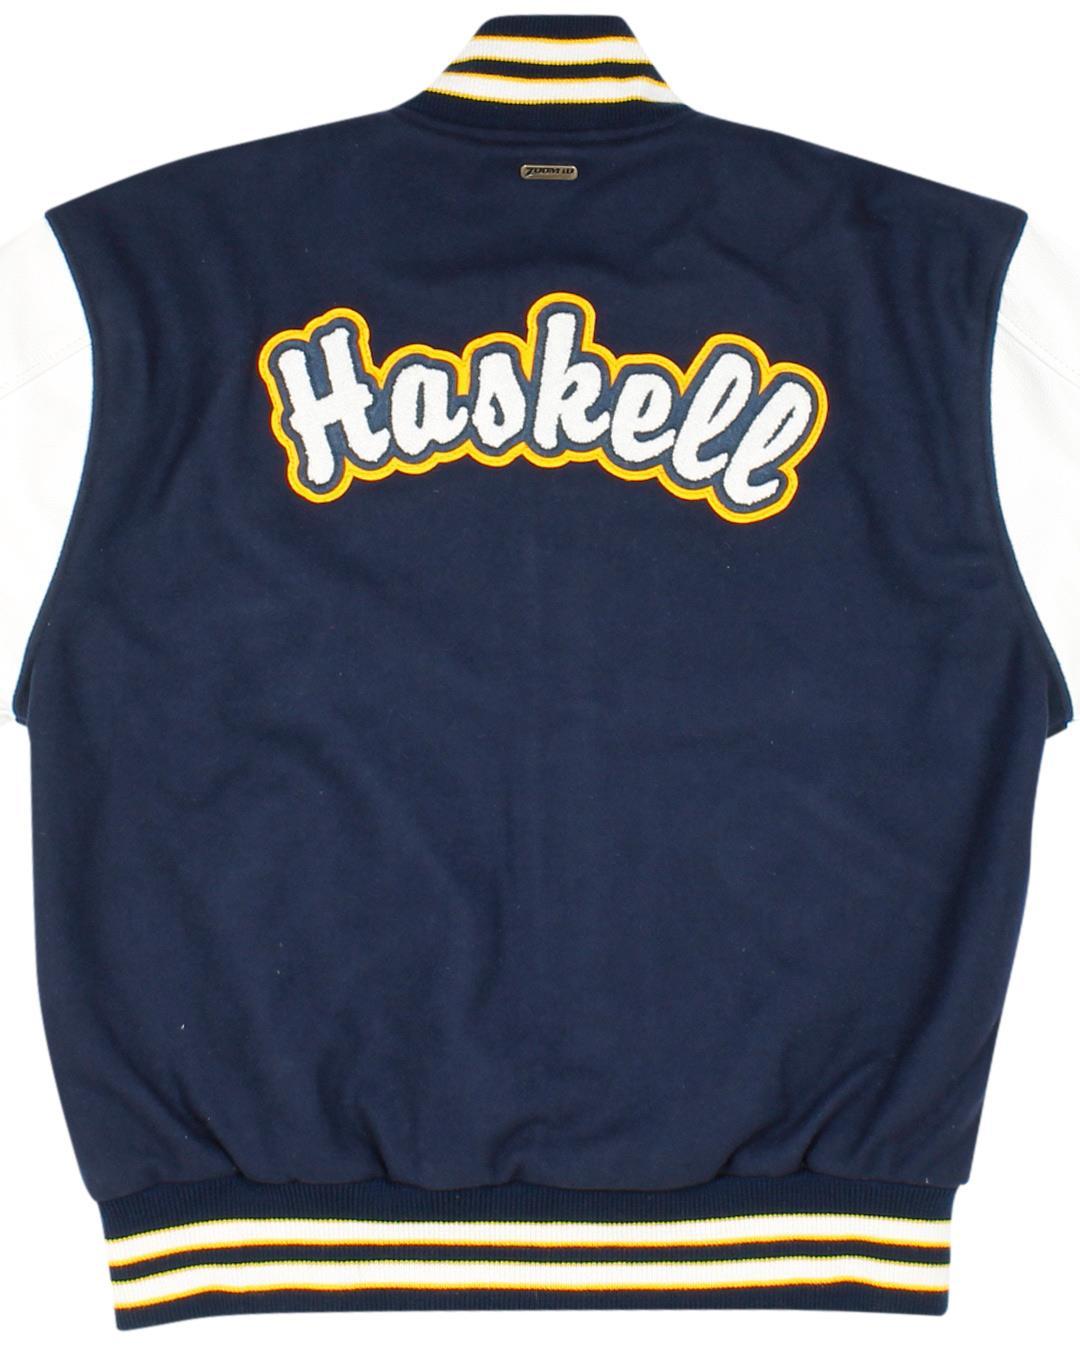 Foothill High School Letterman Jacket, Henderson NV - Back